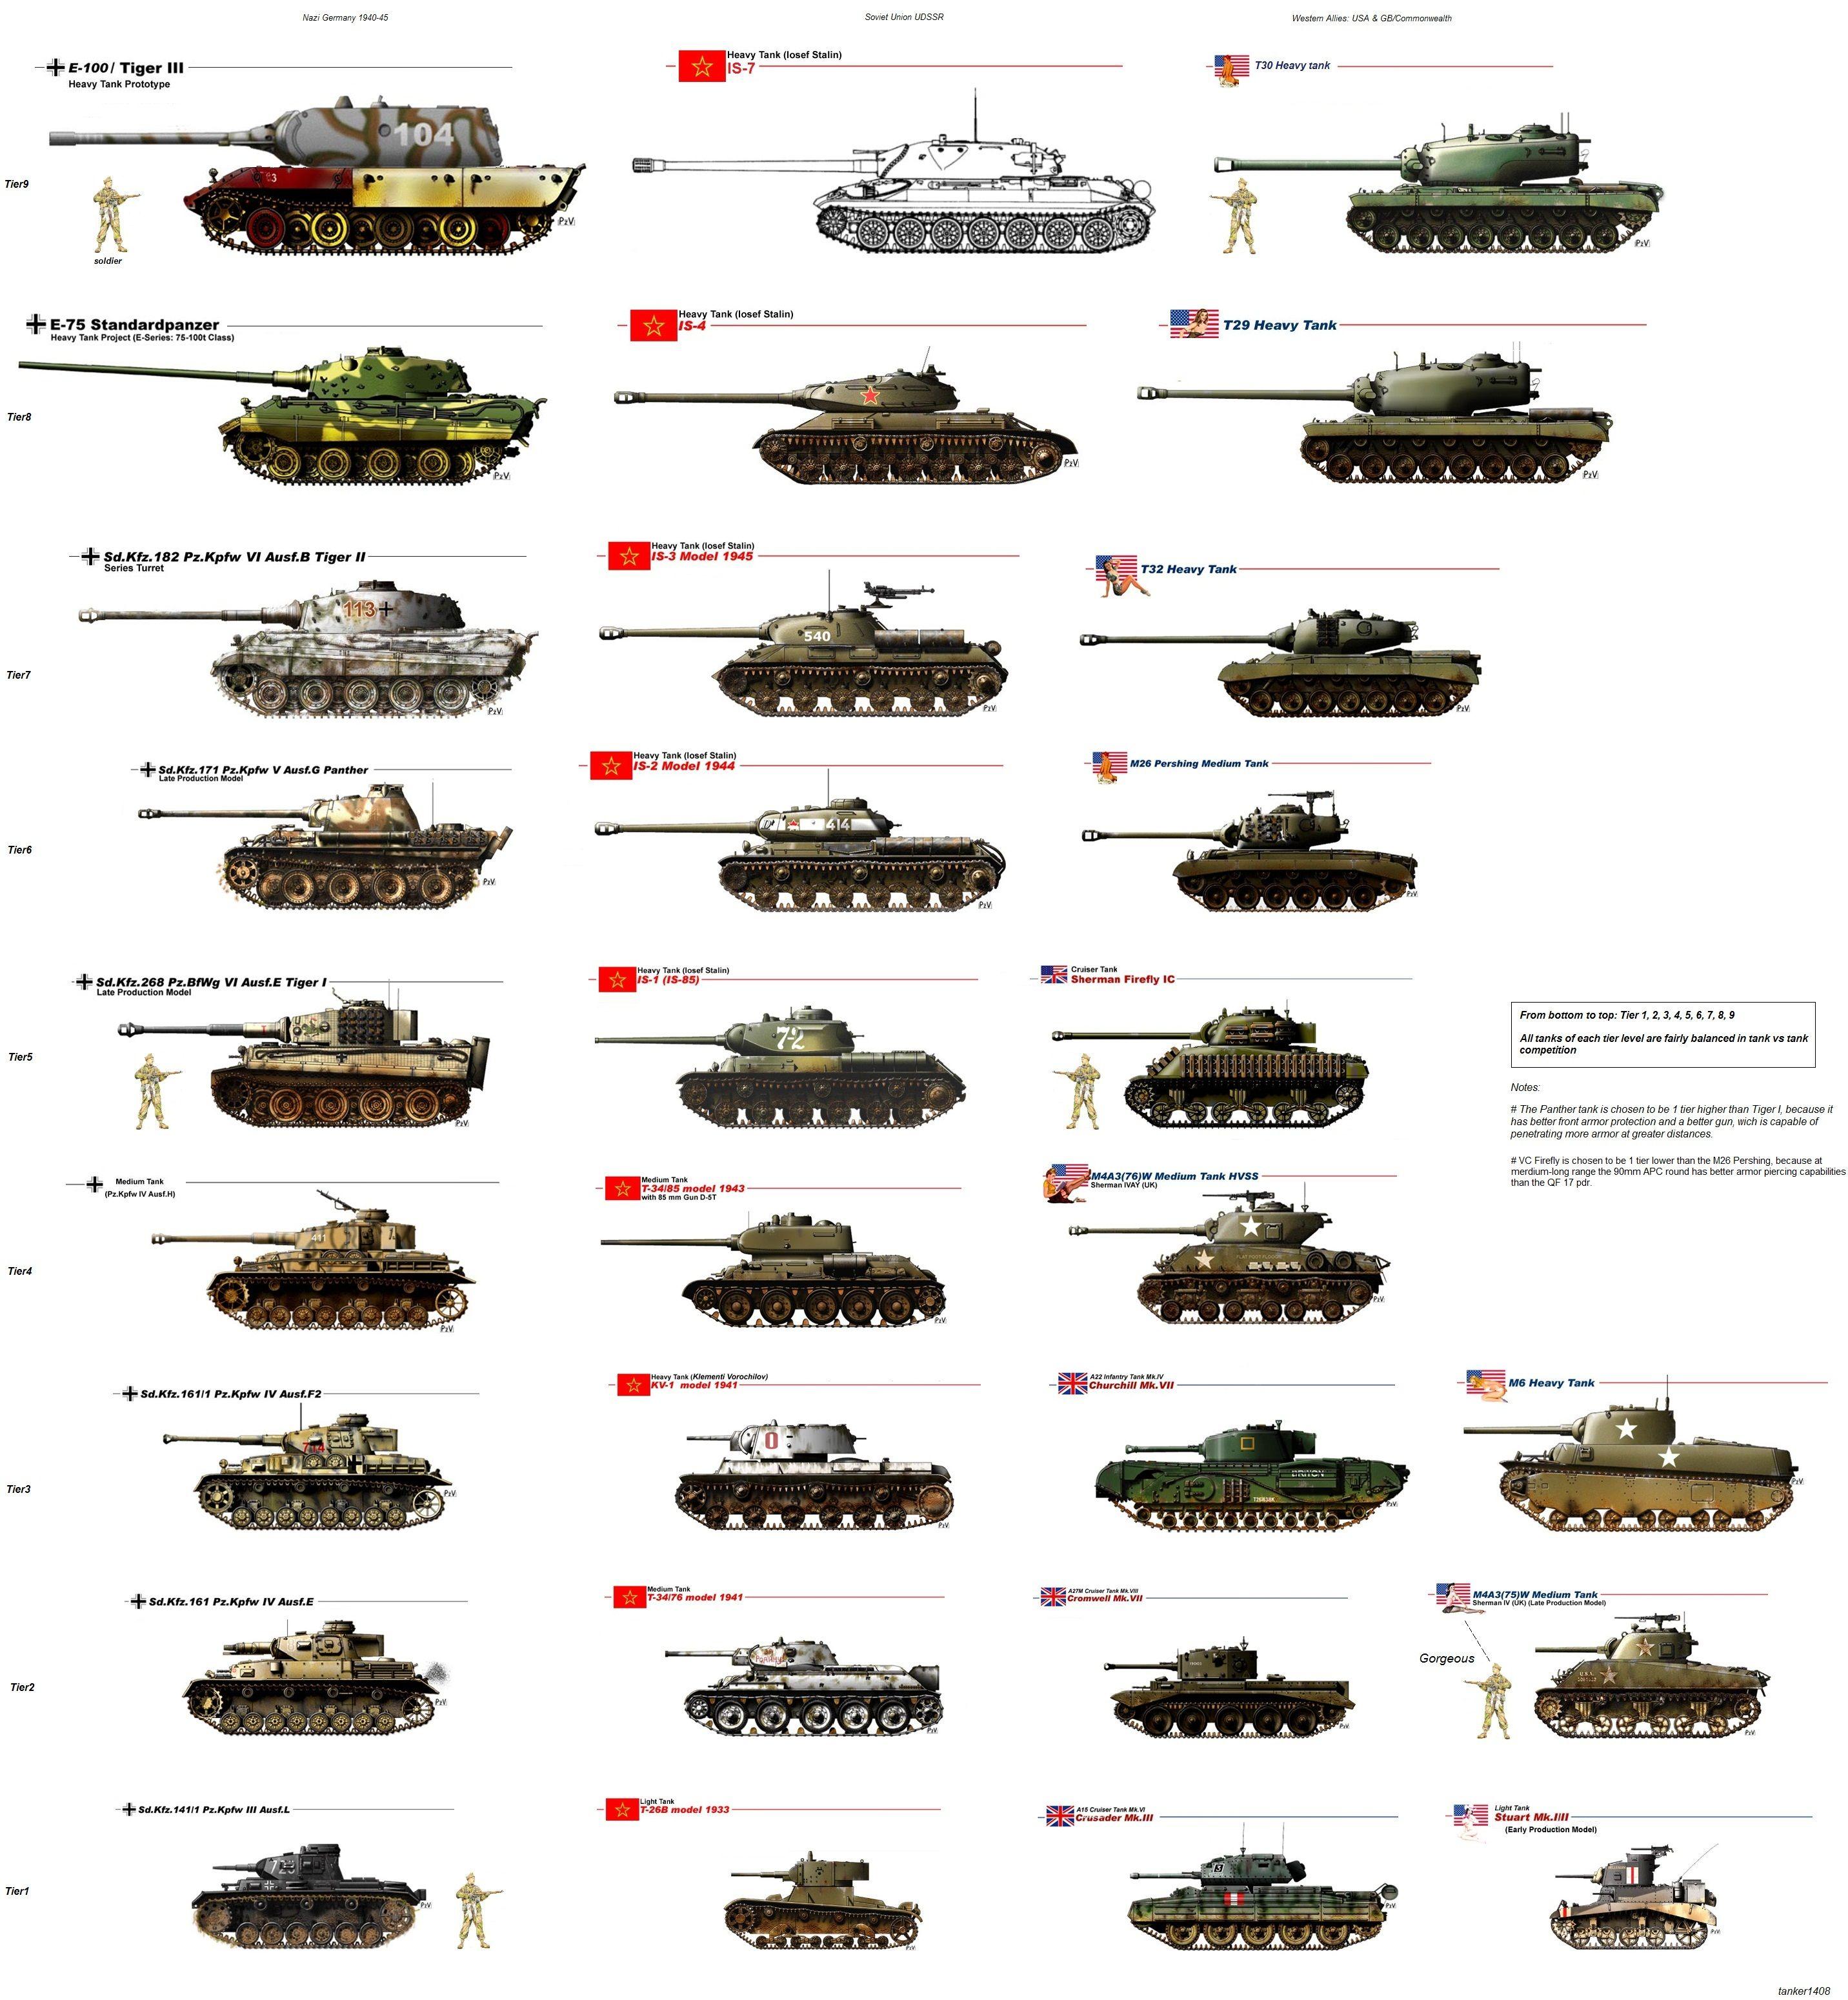 tank photo ww2 wwii pinterest joyeuses f tes militaires et v hicules militaires. Black Bedroom Furniture Sets. Home Design Ideas